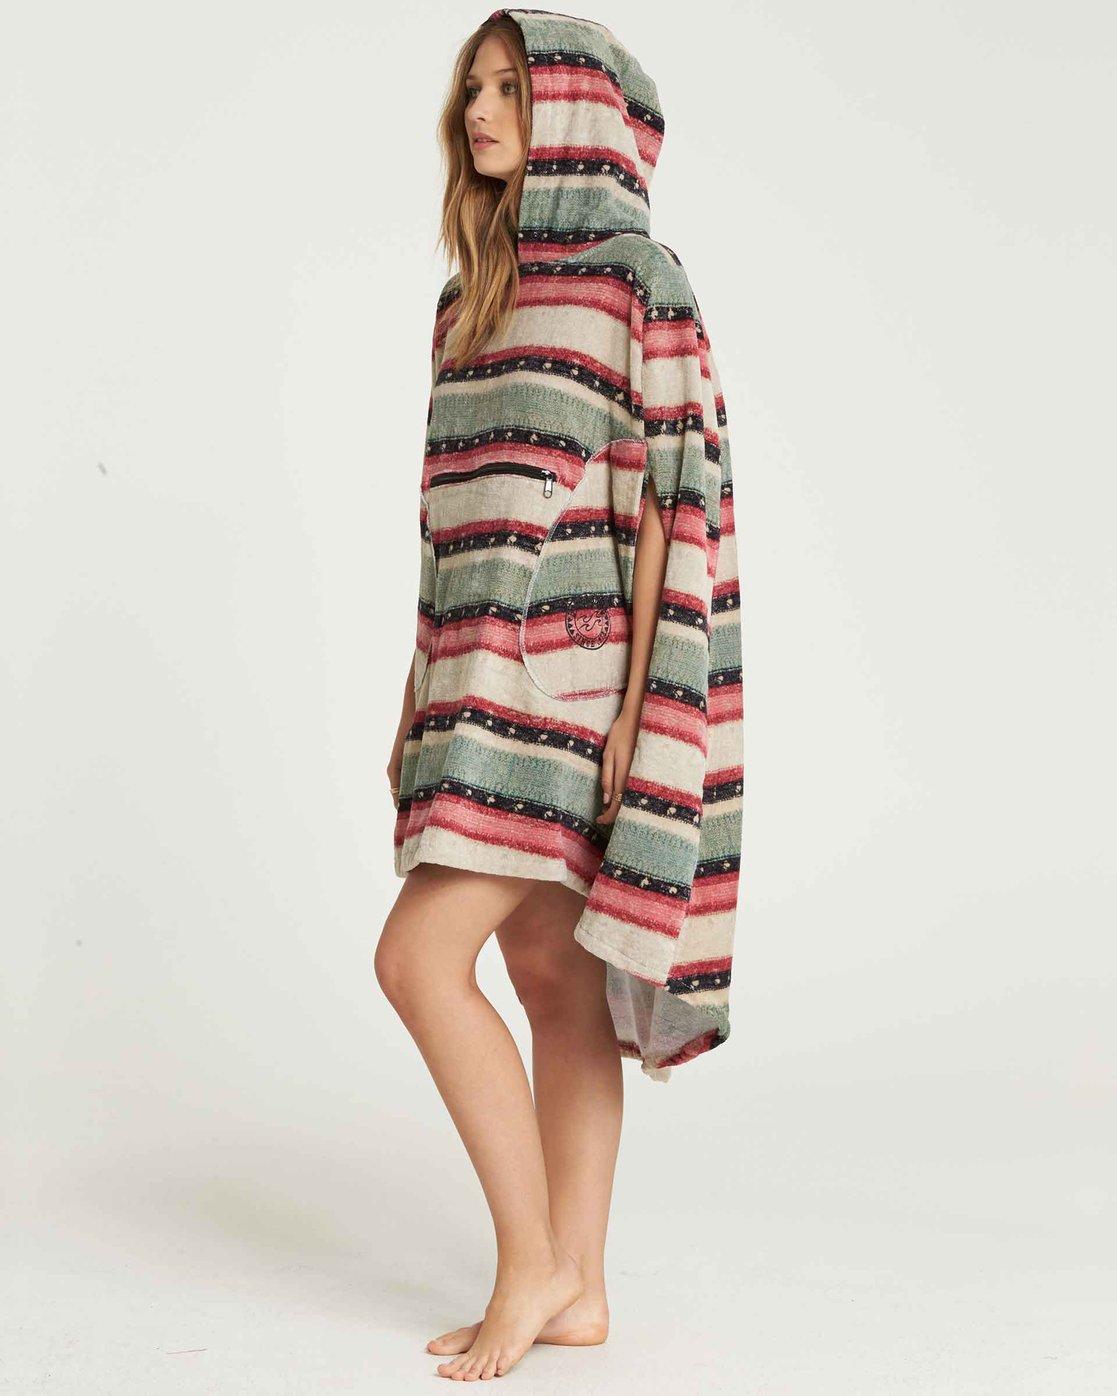 Billabong  | Hooded Towel Changing Poncho  | $74.95